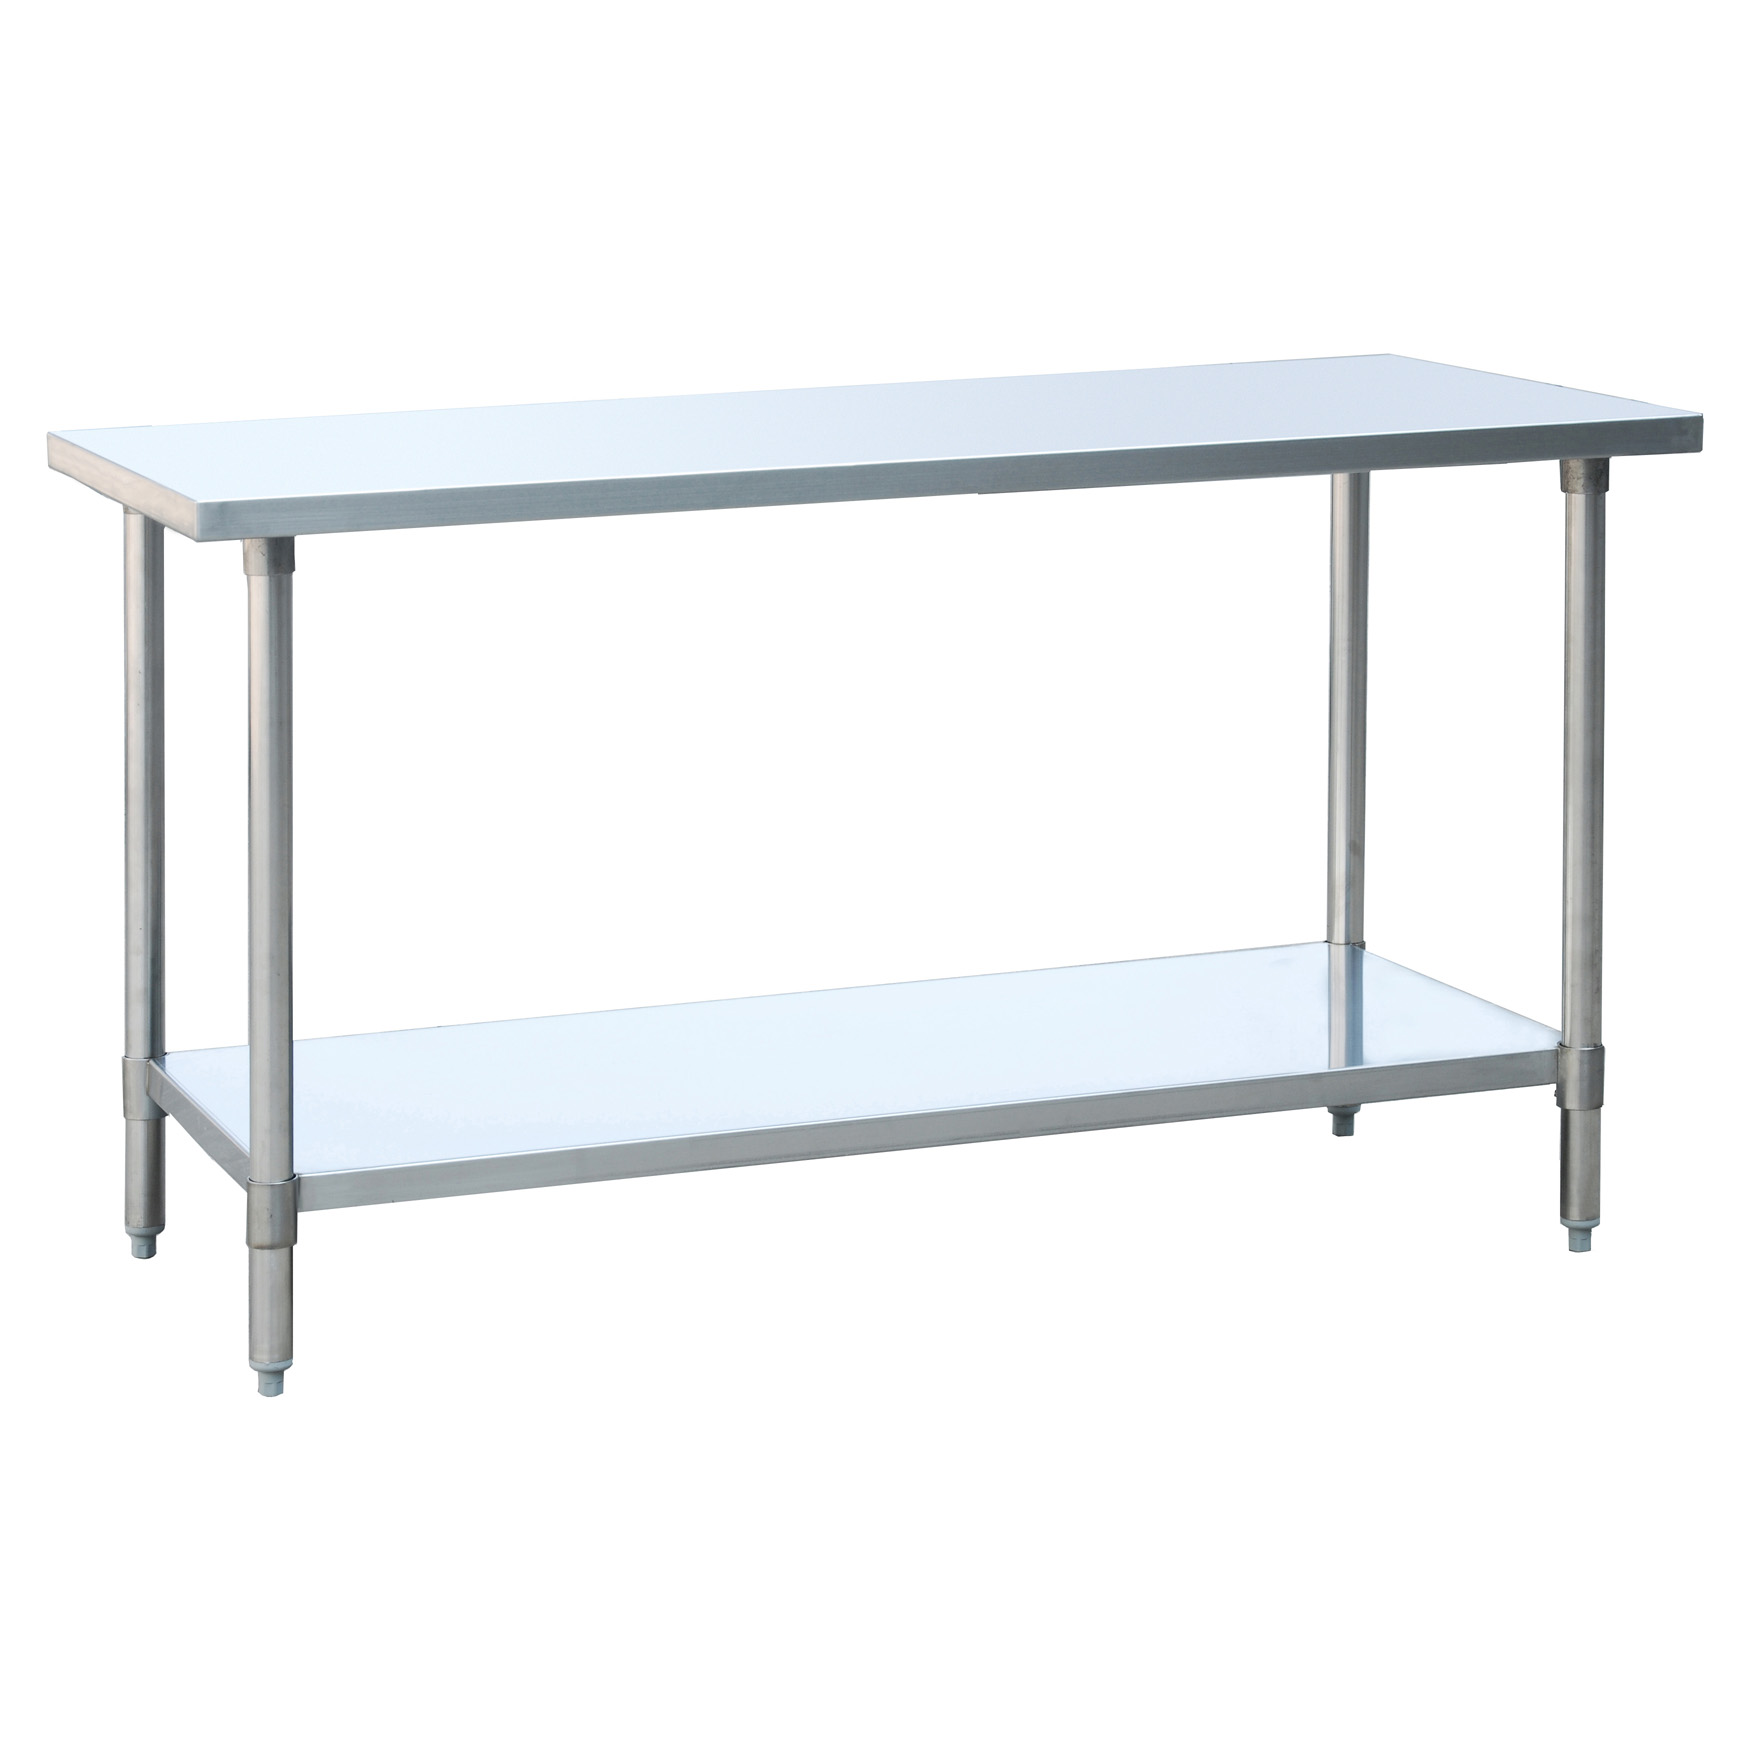 Atosa USA MRTW-3036 work table,  36